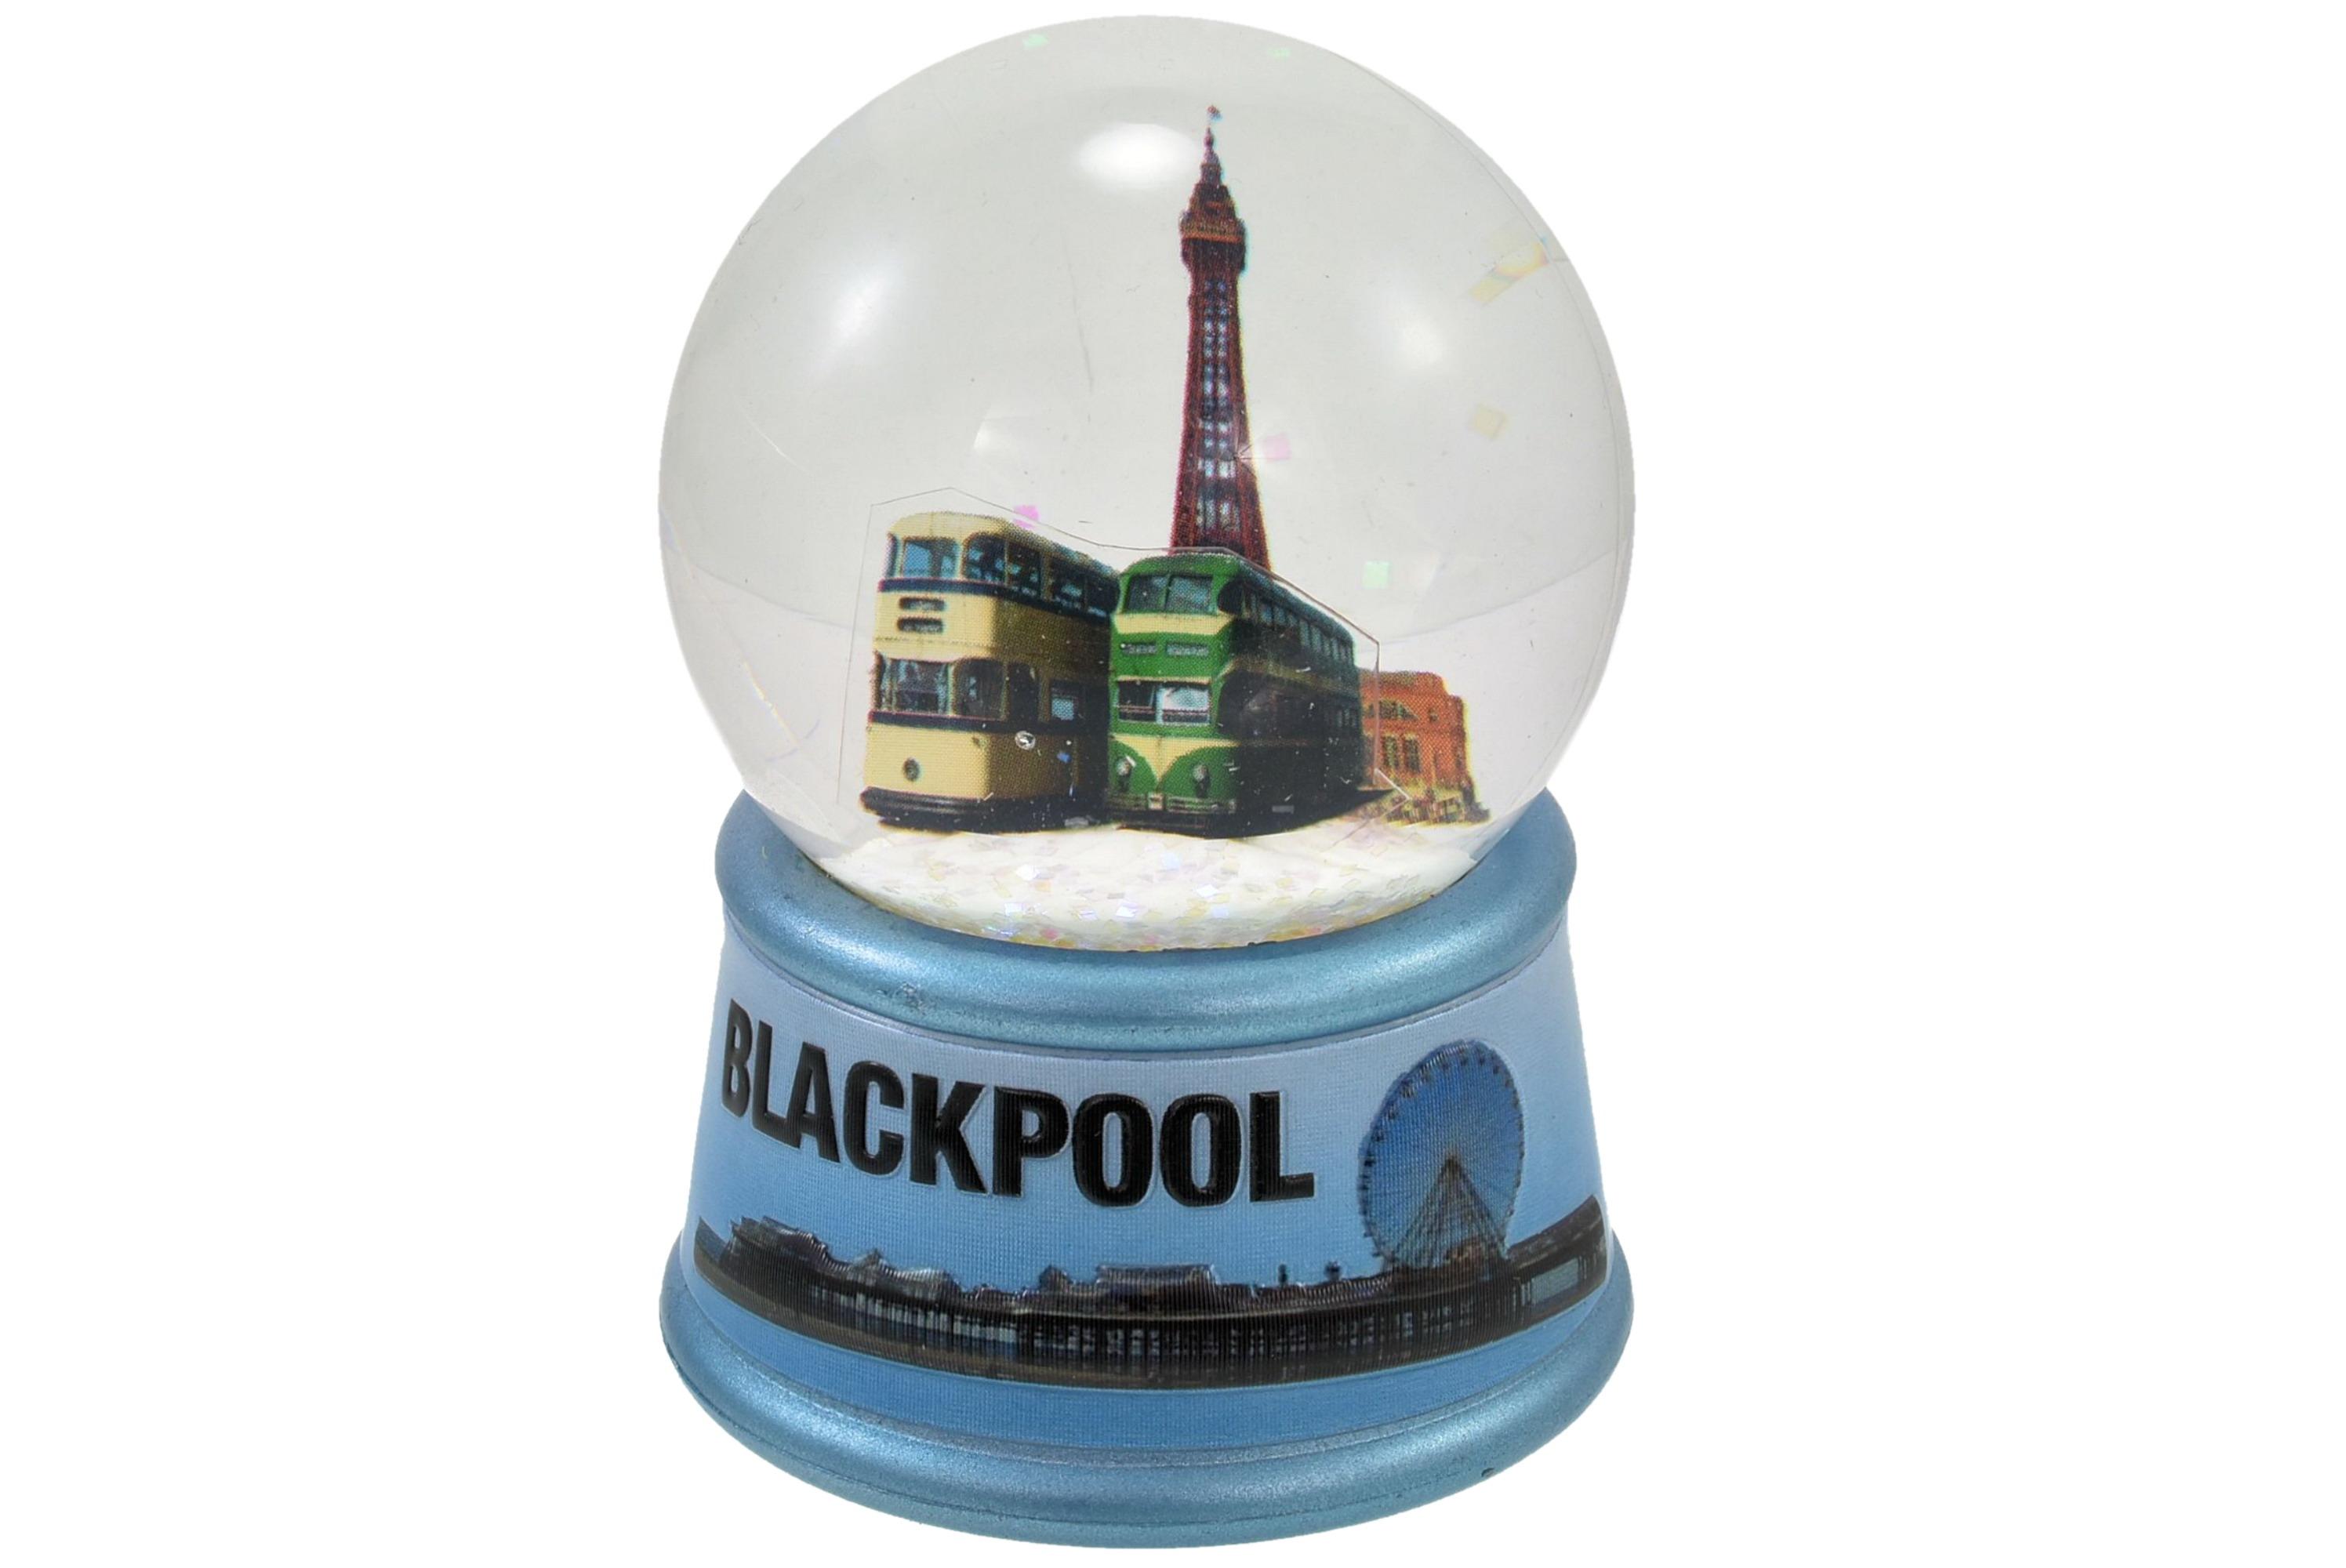 65mm Blackpool Waterball Pvc 3d Wrap